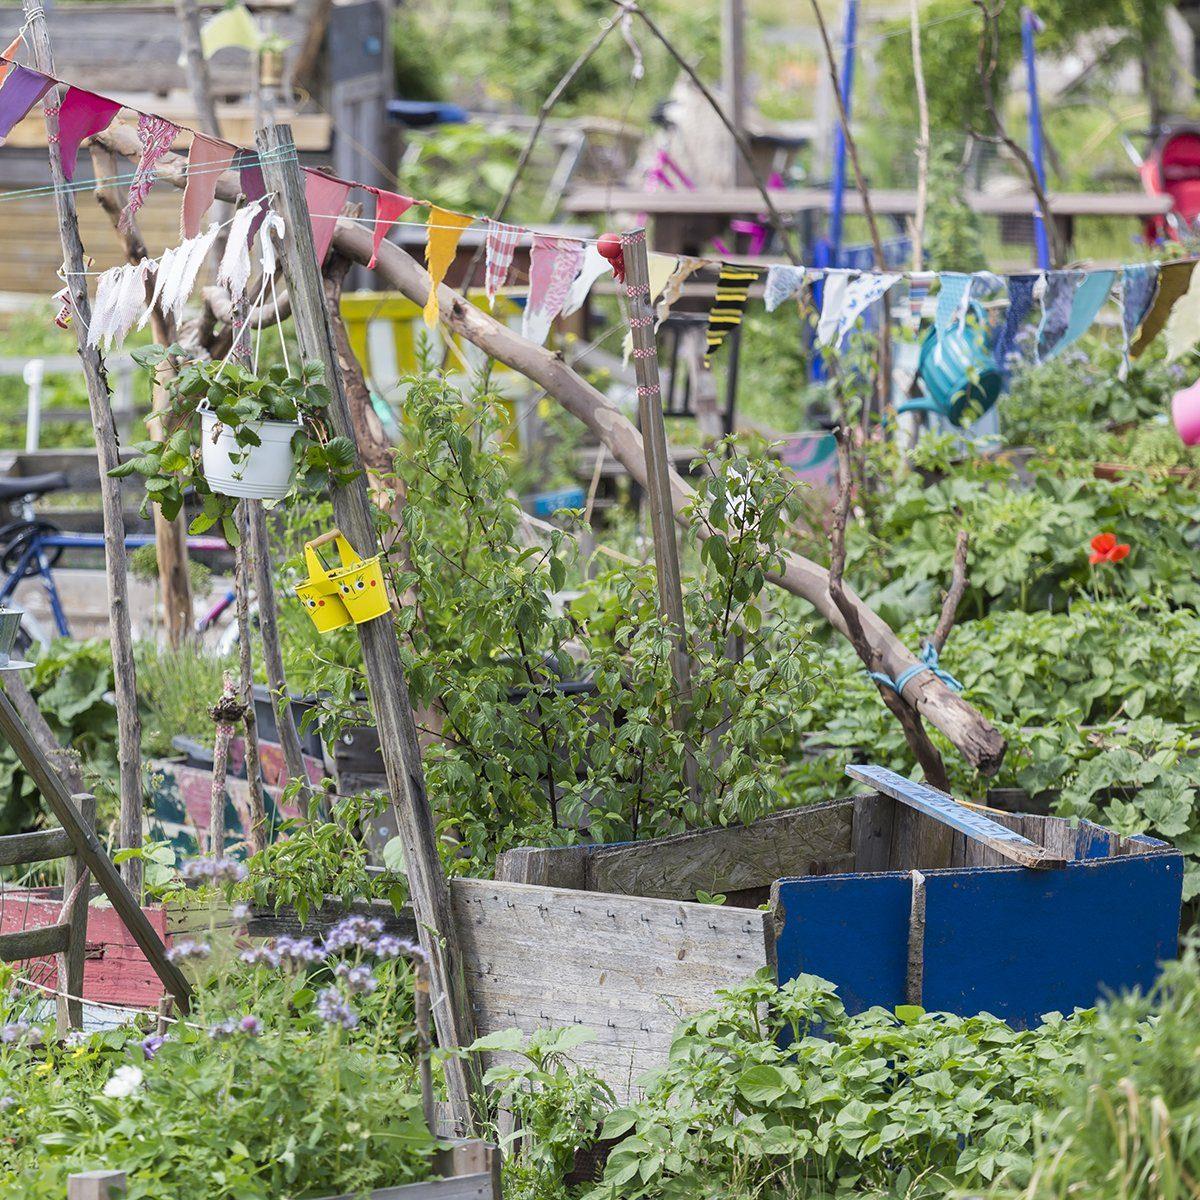 urban gardening at tempelhofer feld berlin germany; Shutterstock ID 656036599; Job (TFH, TOH, RD, BNB, CWM, CM): TOH